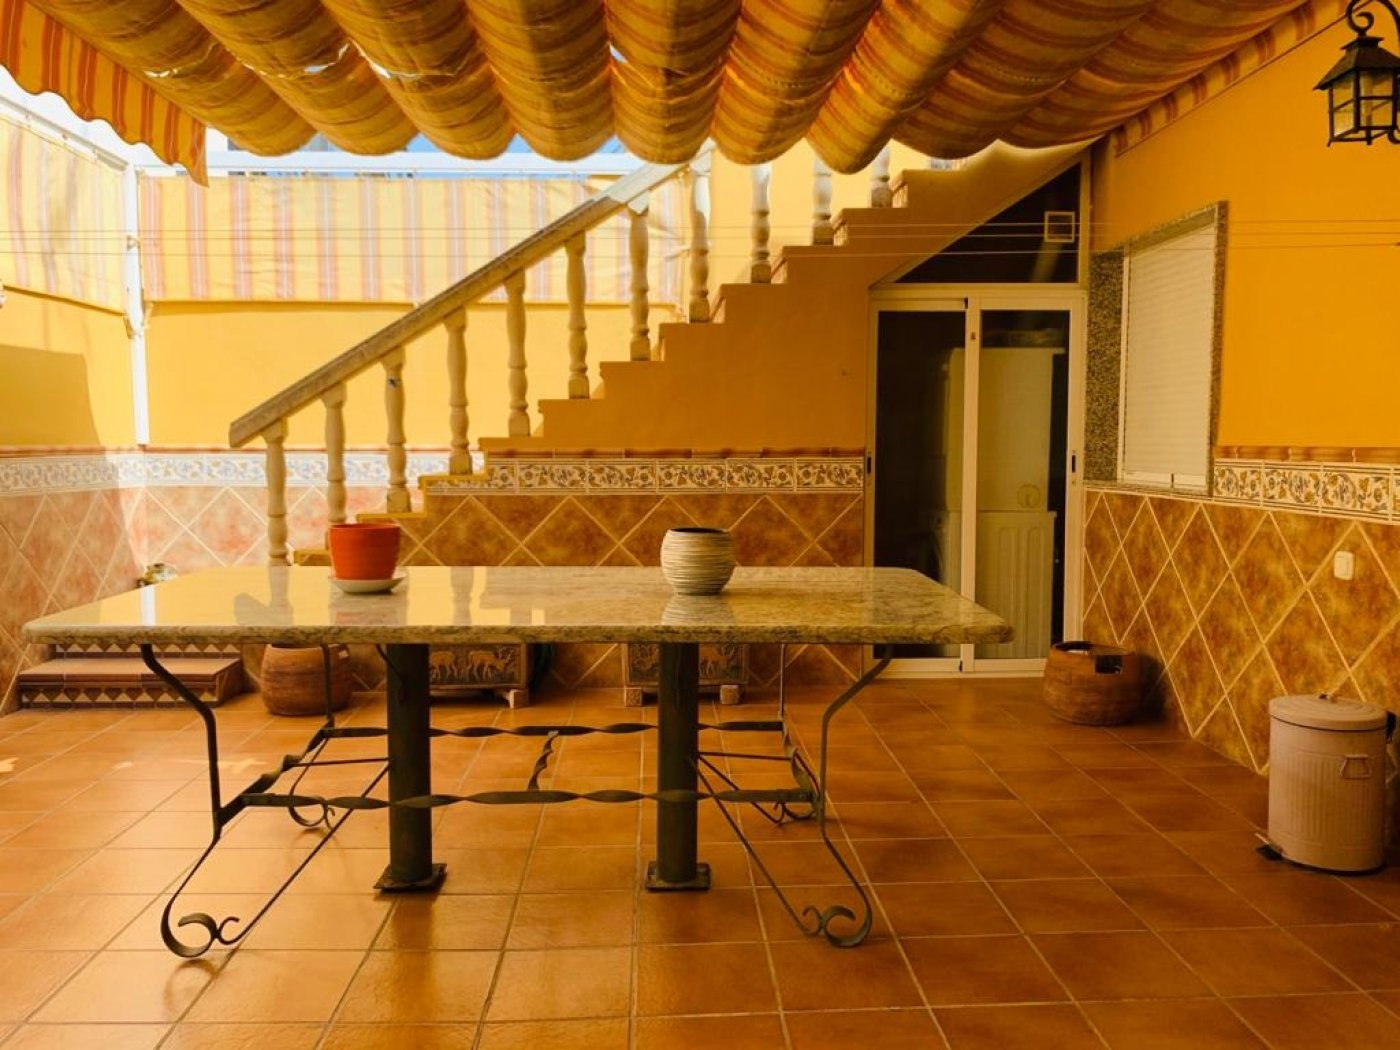 Vivienda sobre almacén en Vicar - La Gangosa